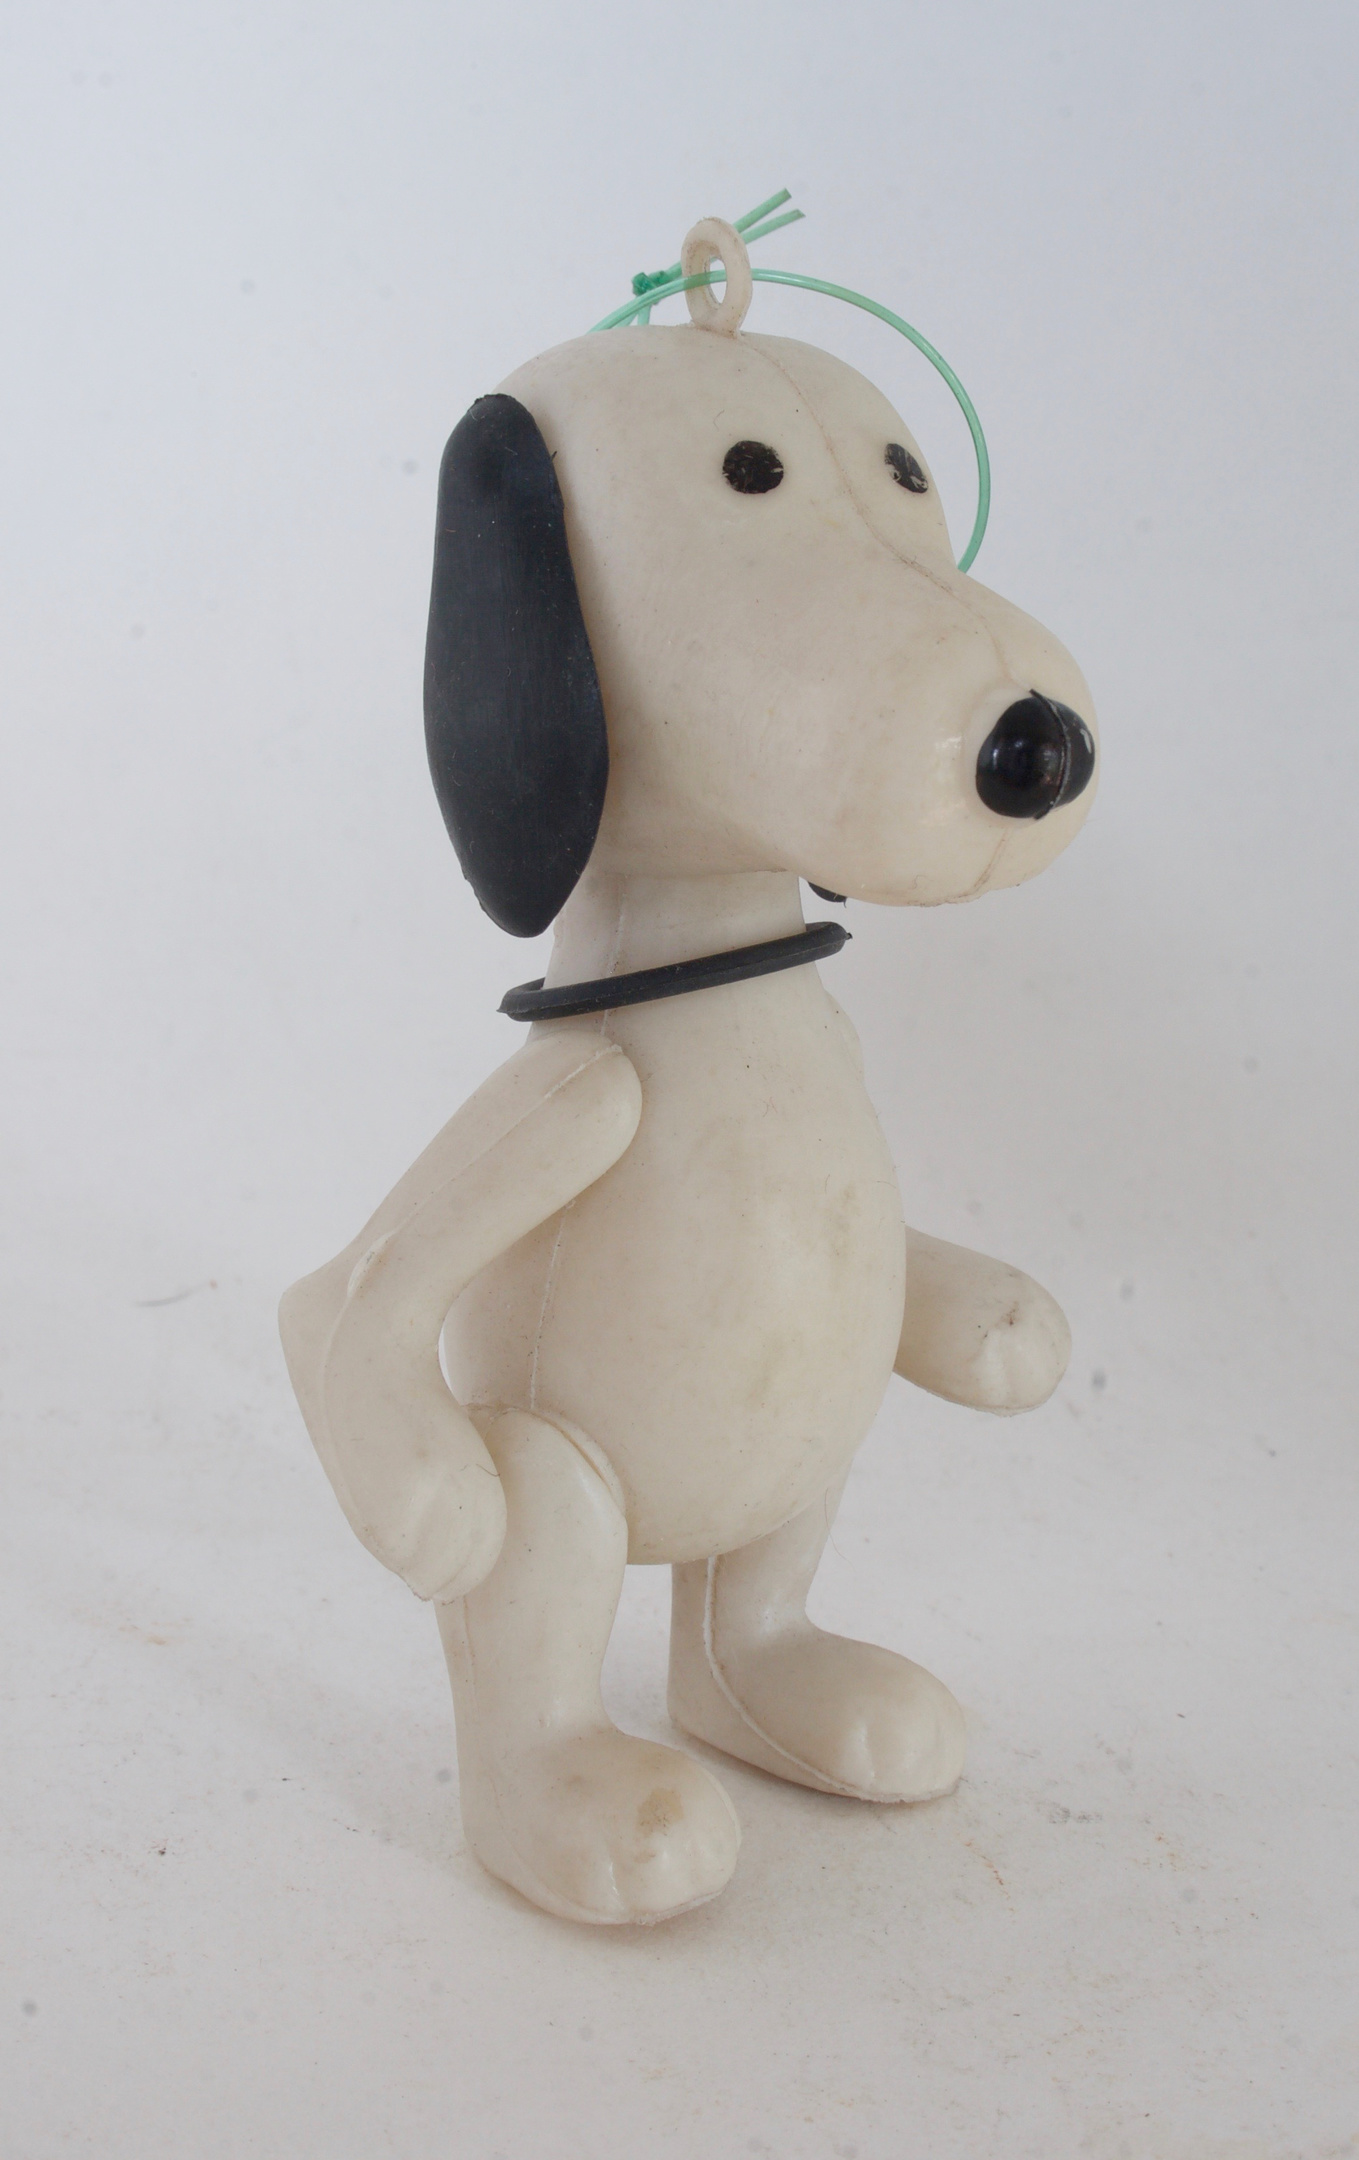 Vintage Snoopy Plastic Ornament | Collectors Weekly